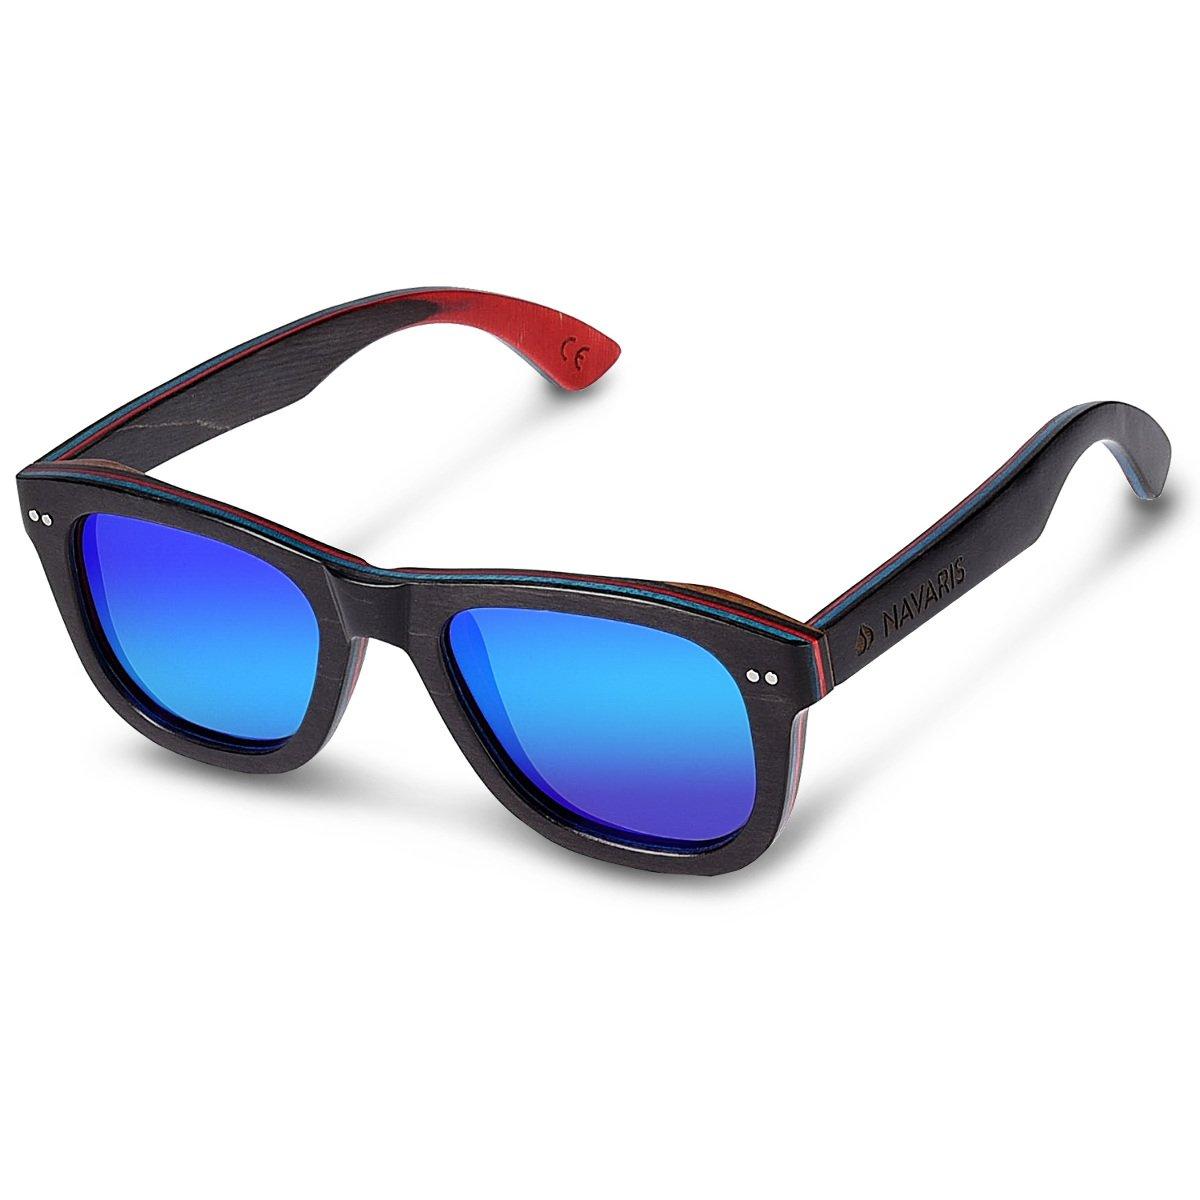 d8a83d37ad4 Navaris UV400 Vintage Skateboard Wood Sunglasses - Unisex Retro Wooden  Glasses - Modern Wood Shades Women Men - Eyewear with Case Polarized Lenses   ...